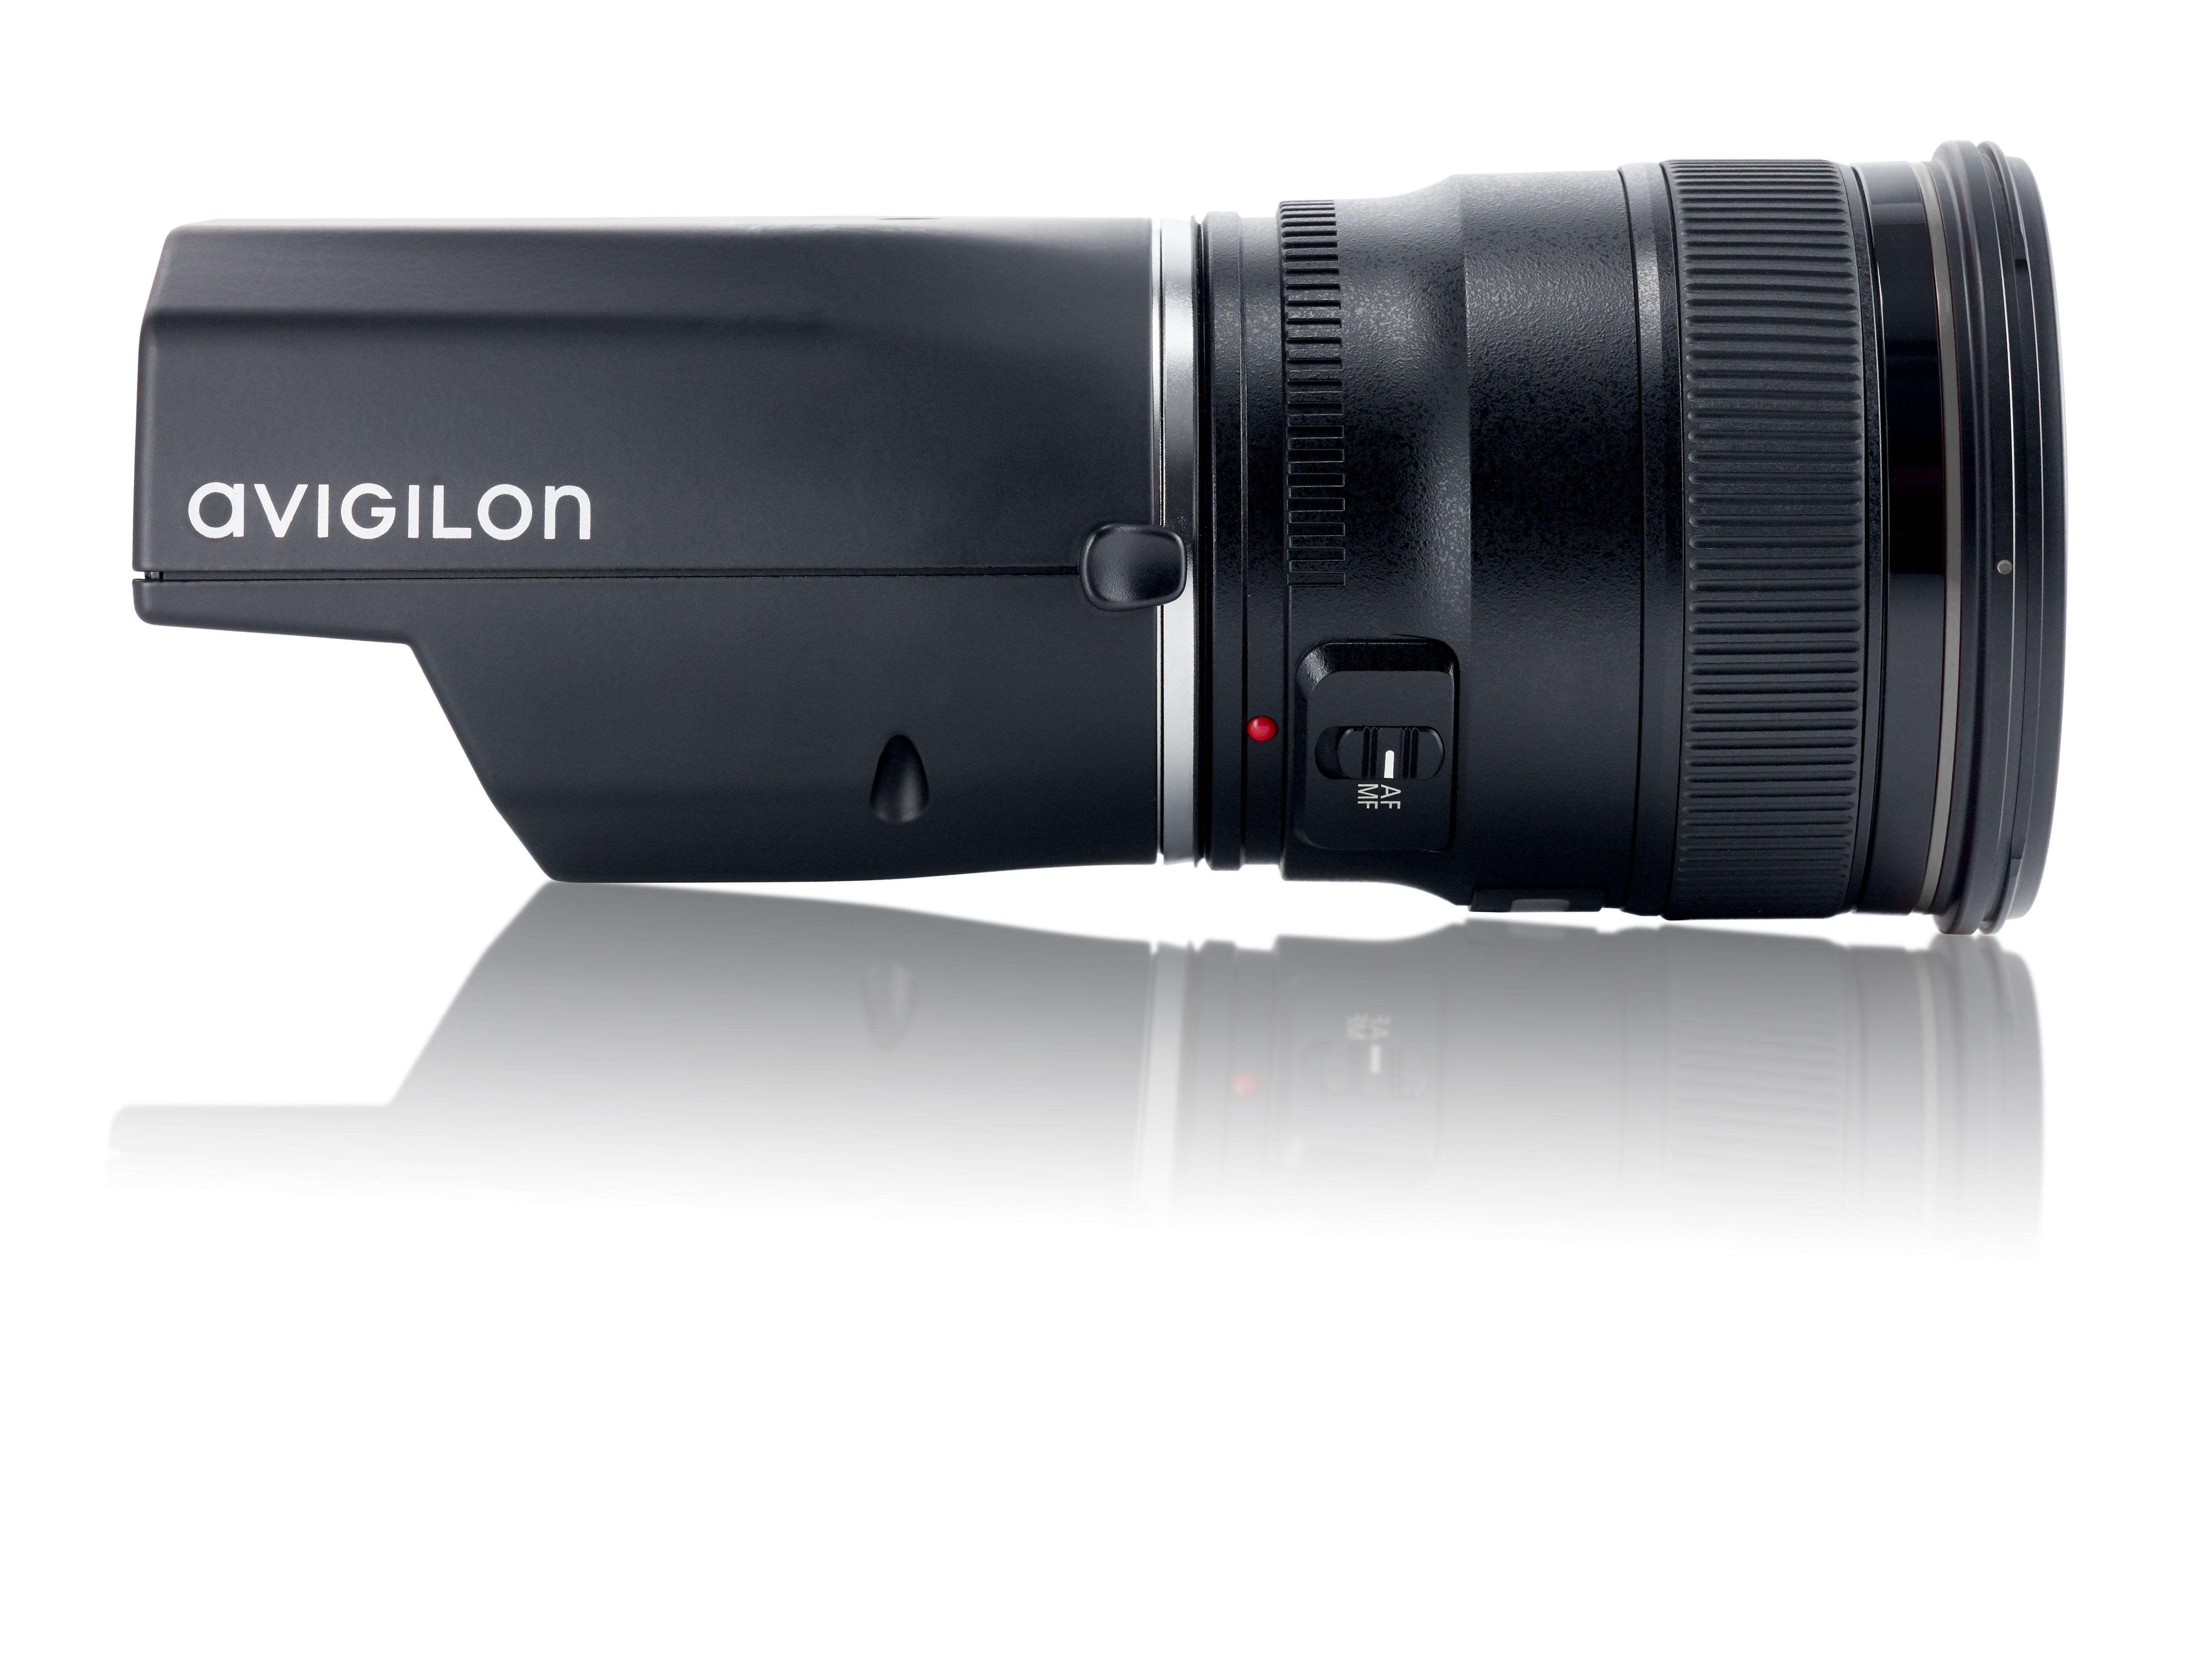 Avigilon HD Pro Cameras